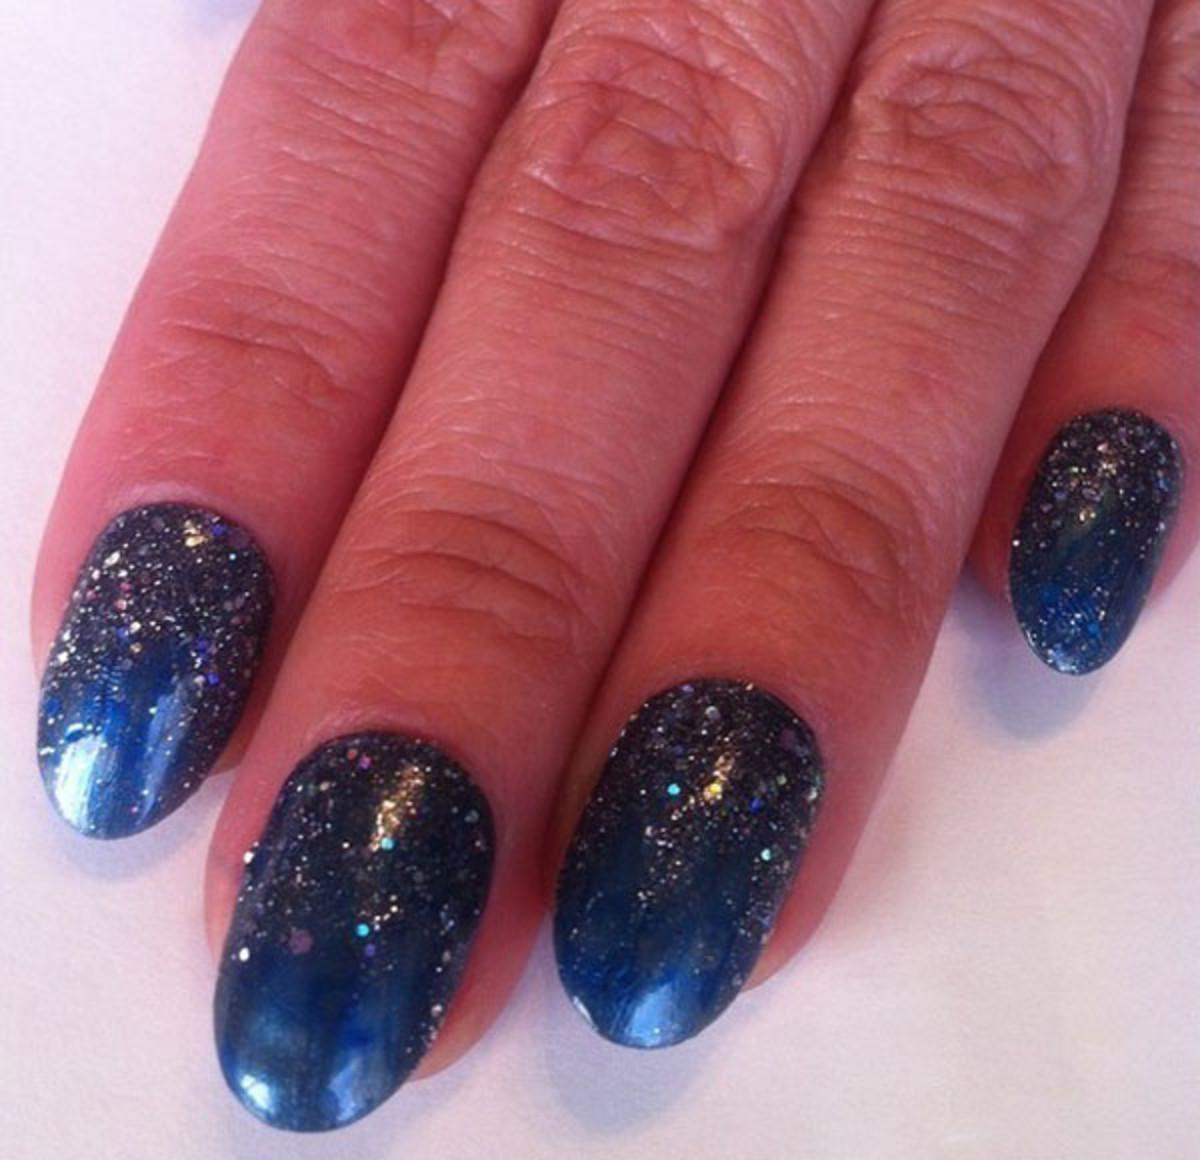 Starry night manicure